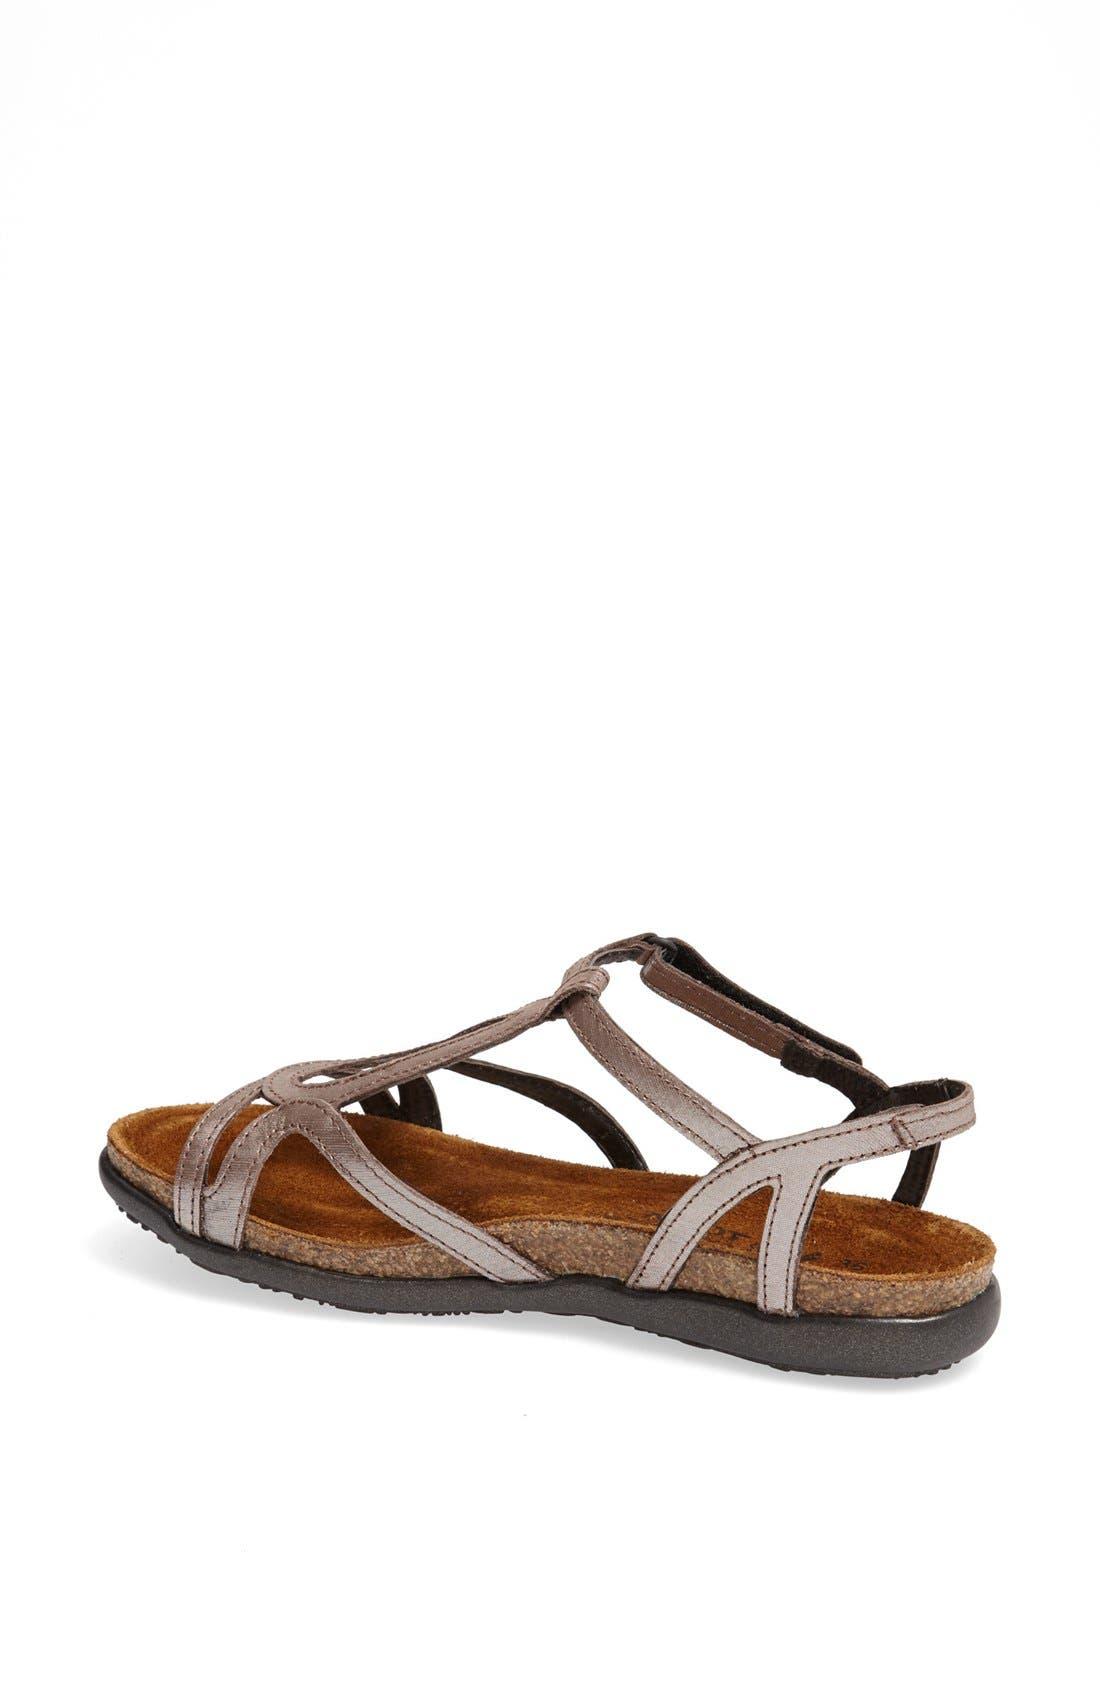 'Dorith' Sandal,                             Alternate thumbnail 2, color,                             Silver Threads Leather